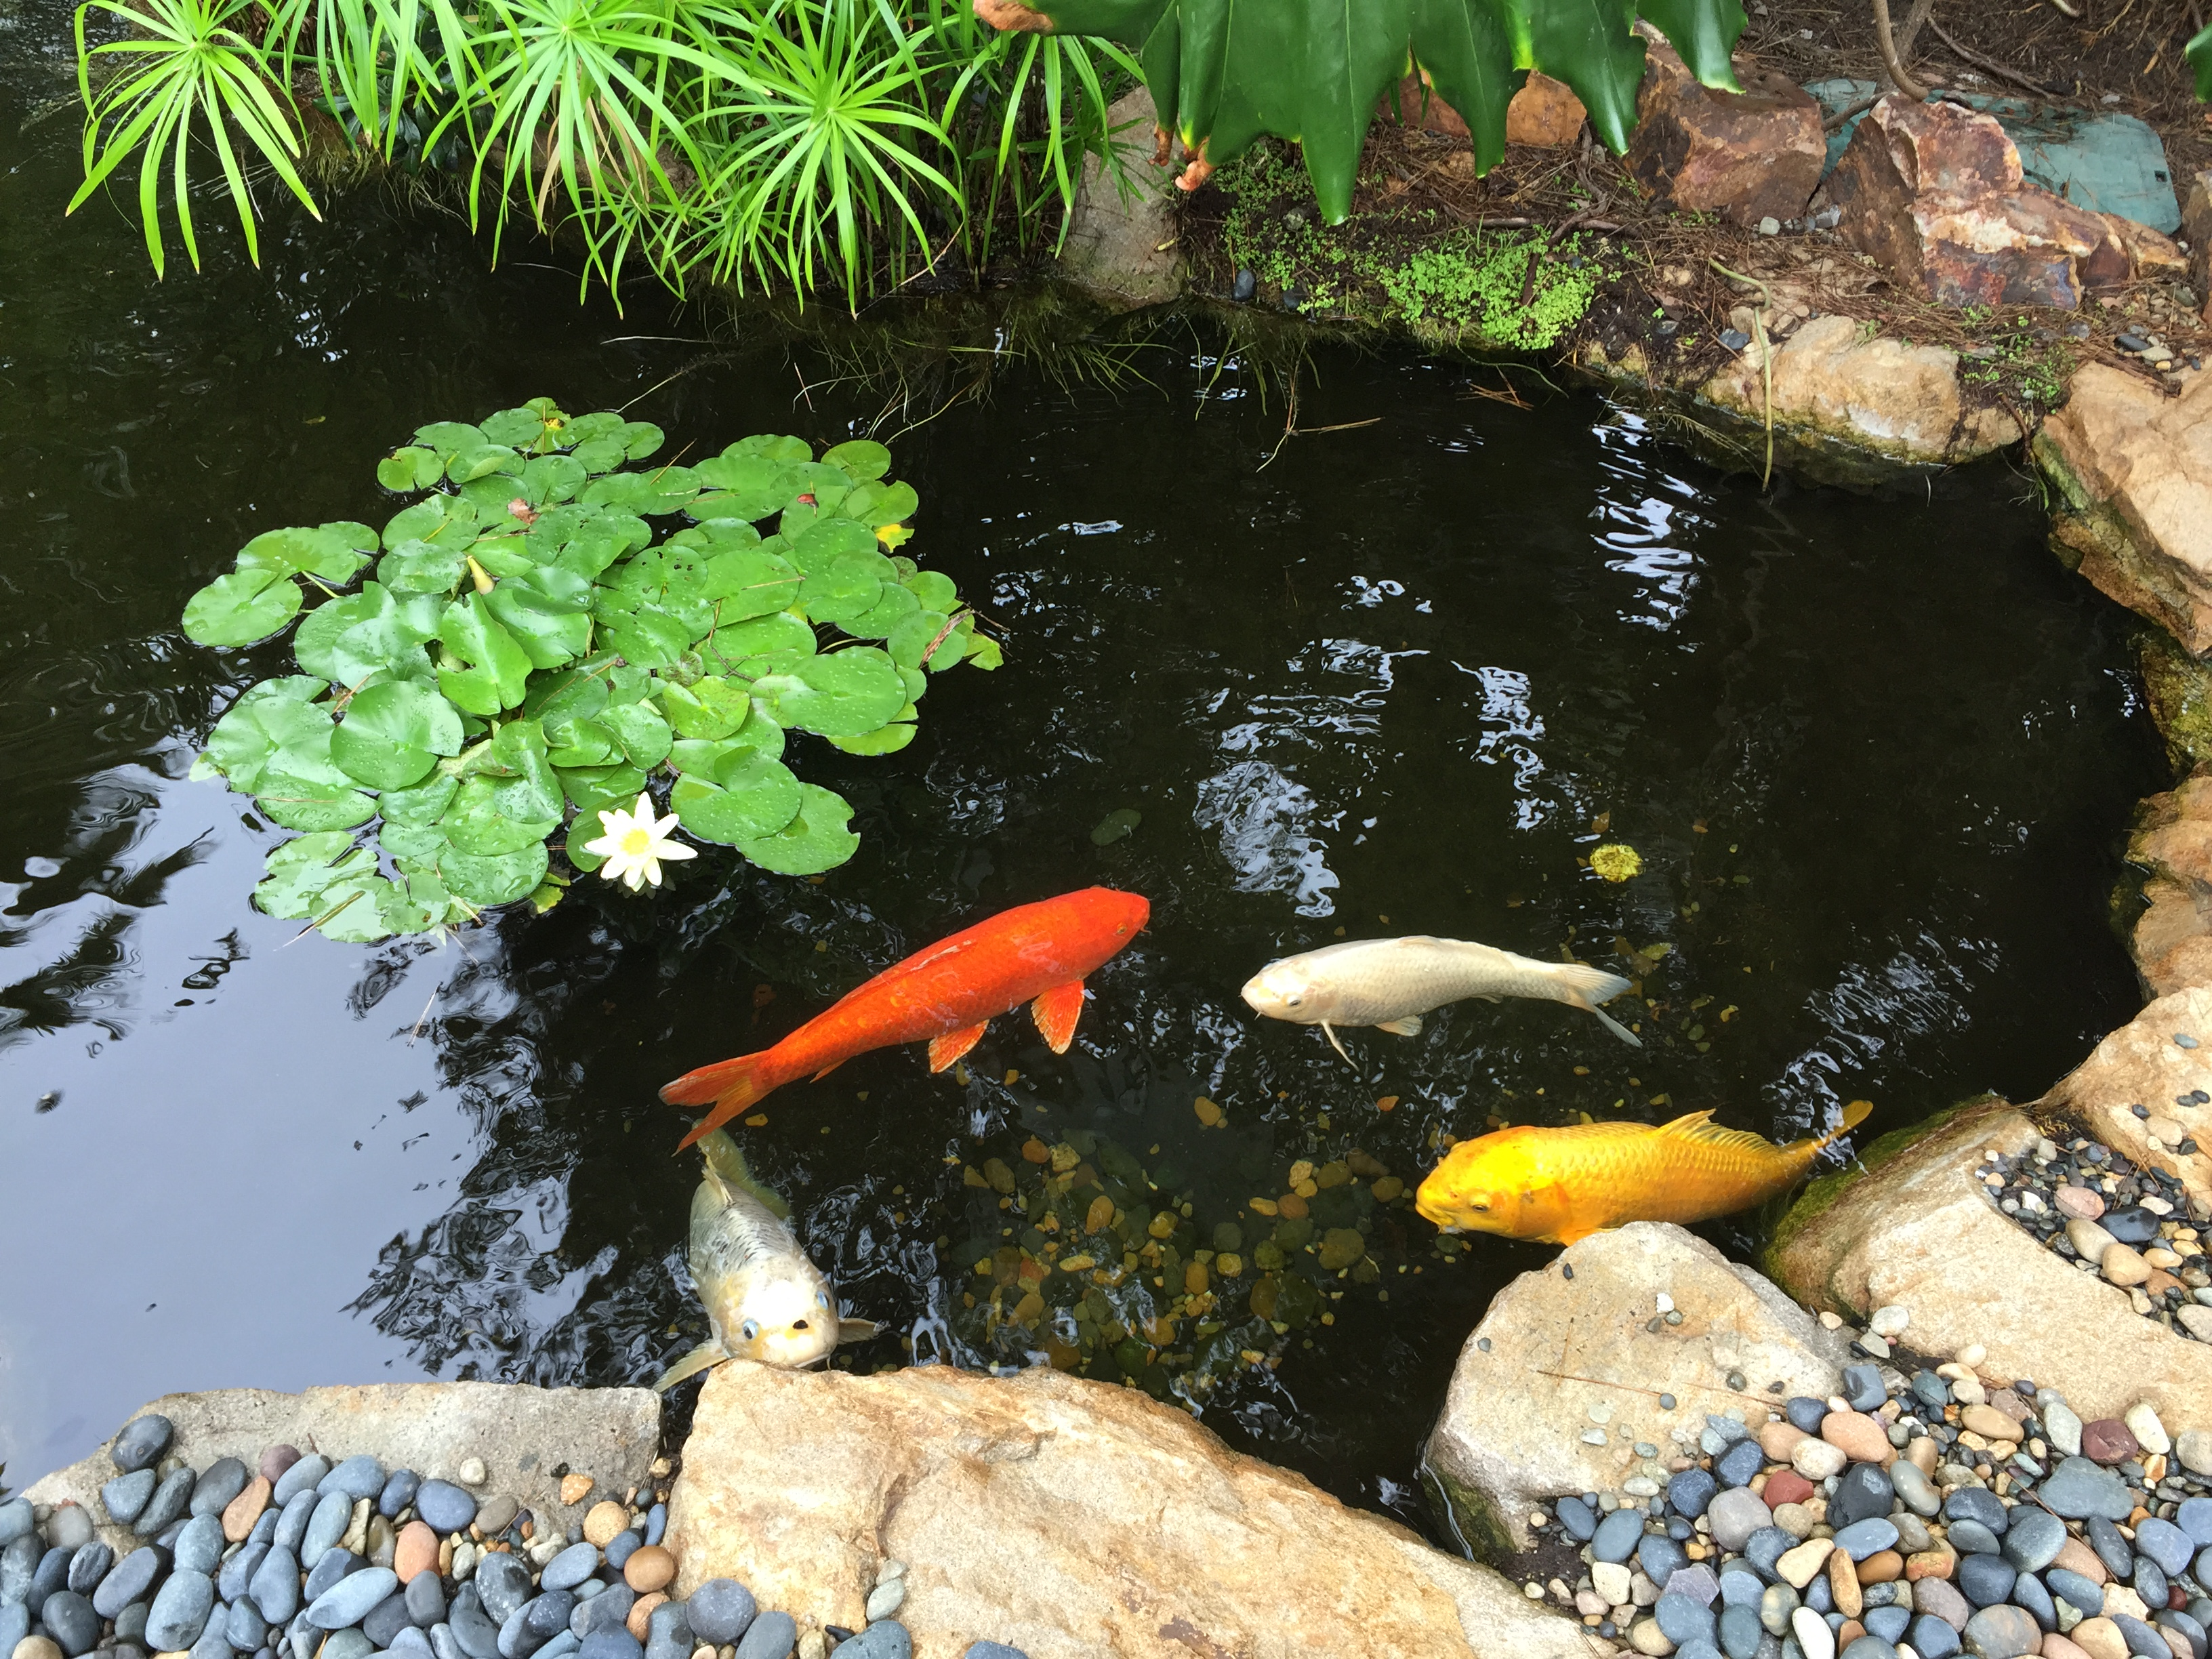 Koi Pond At The Self Realization Fellowship Meditation Gardens